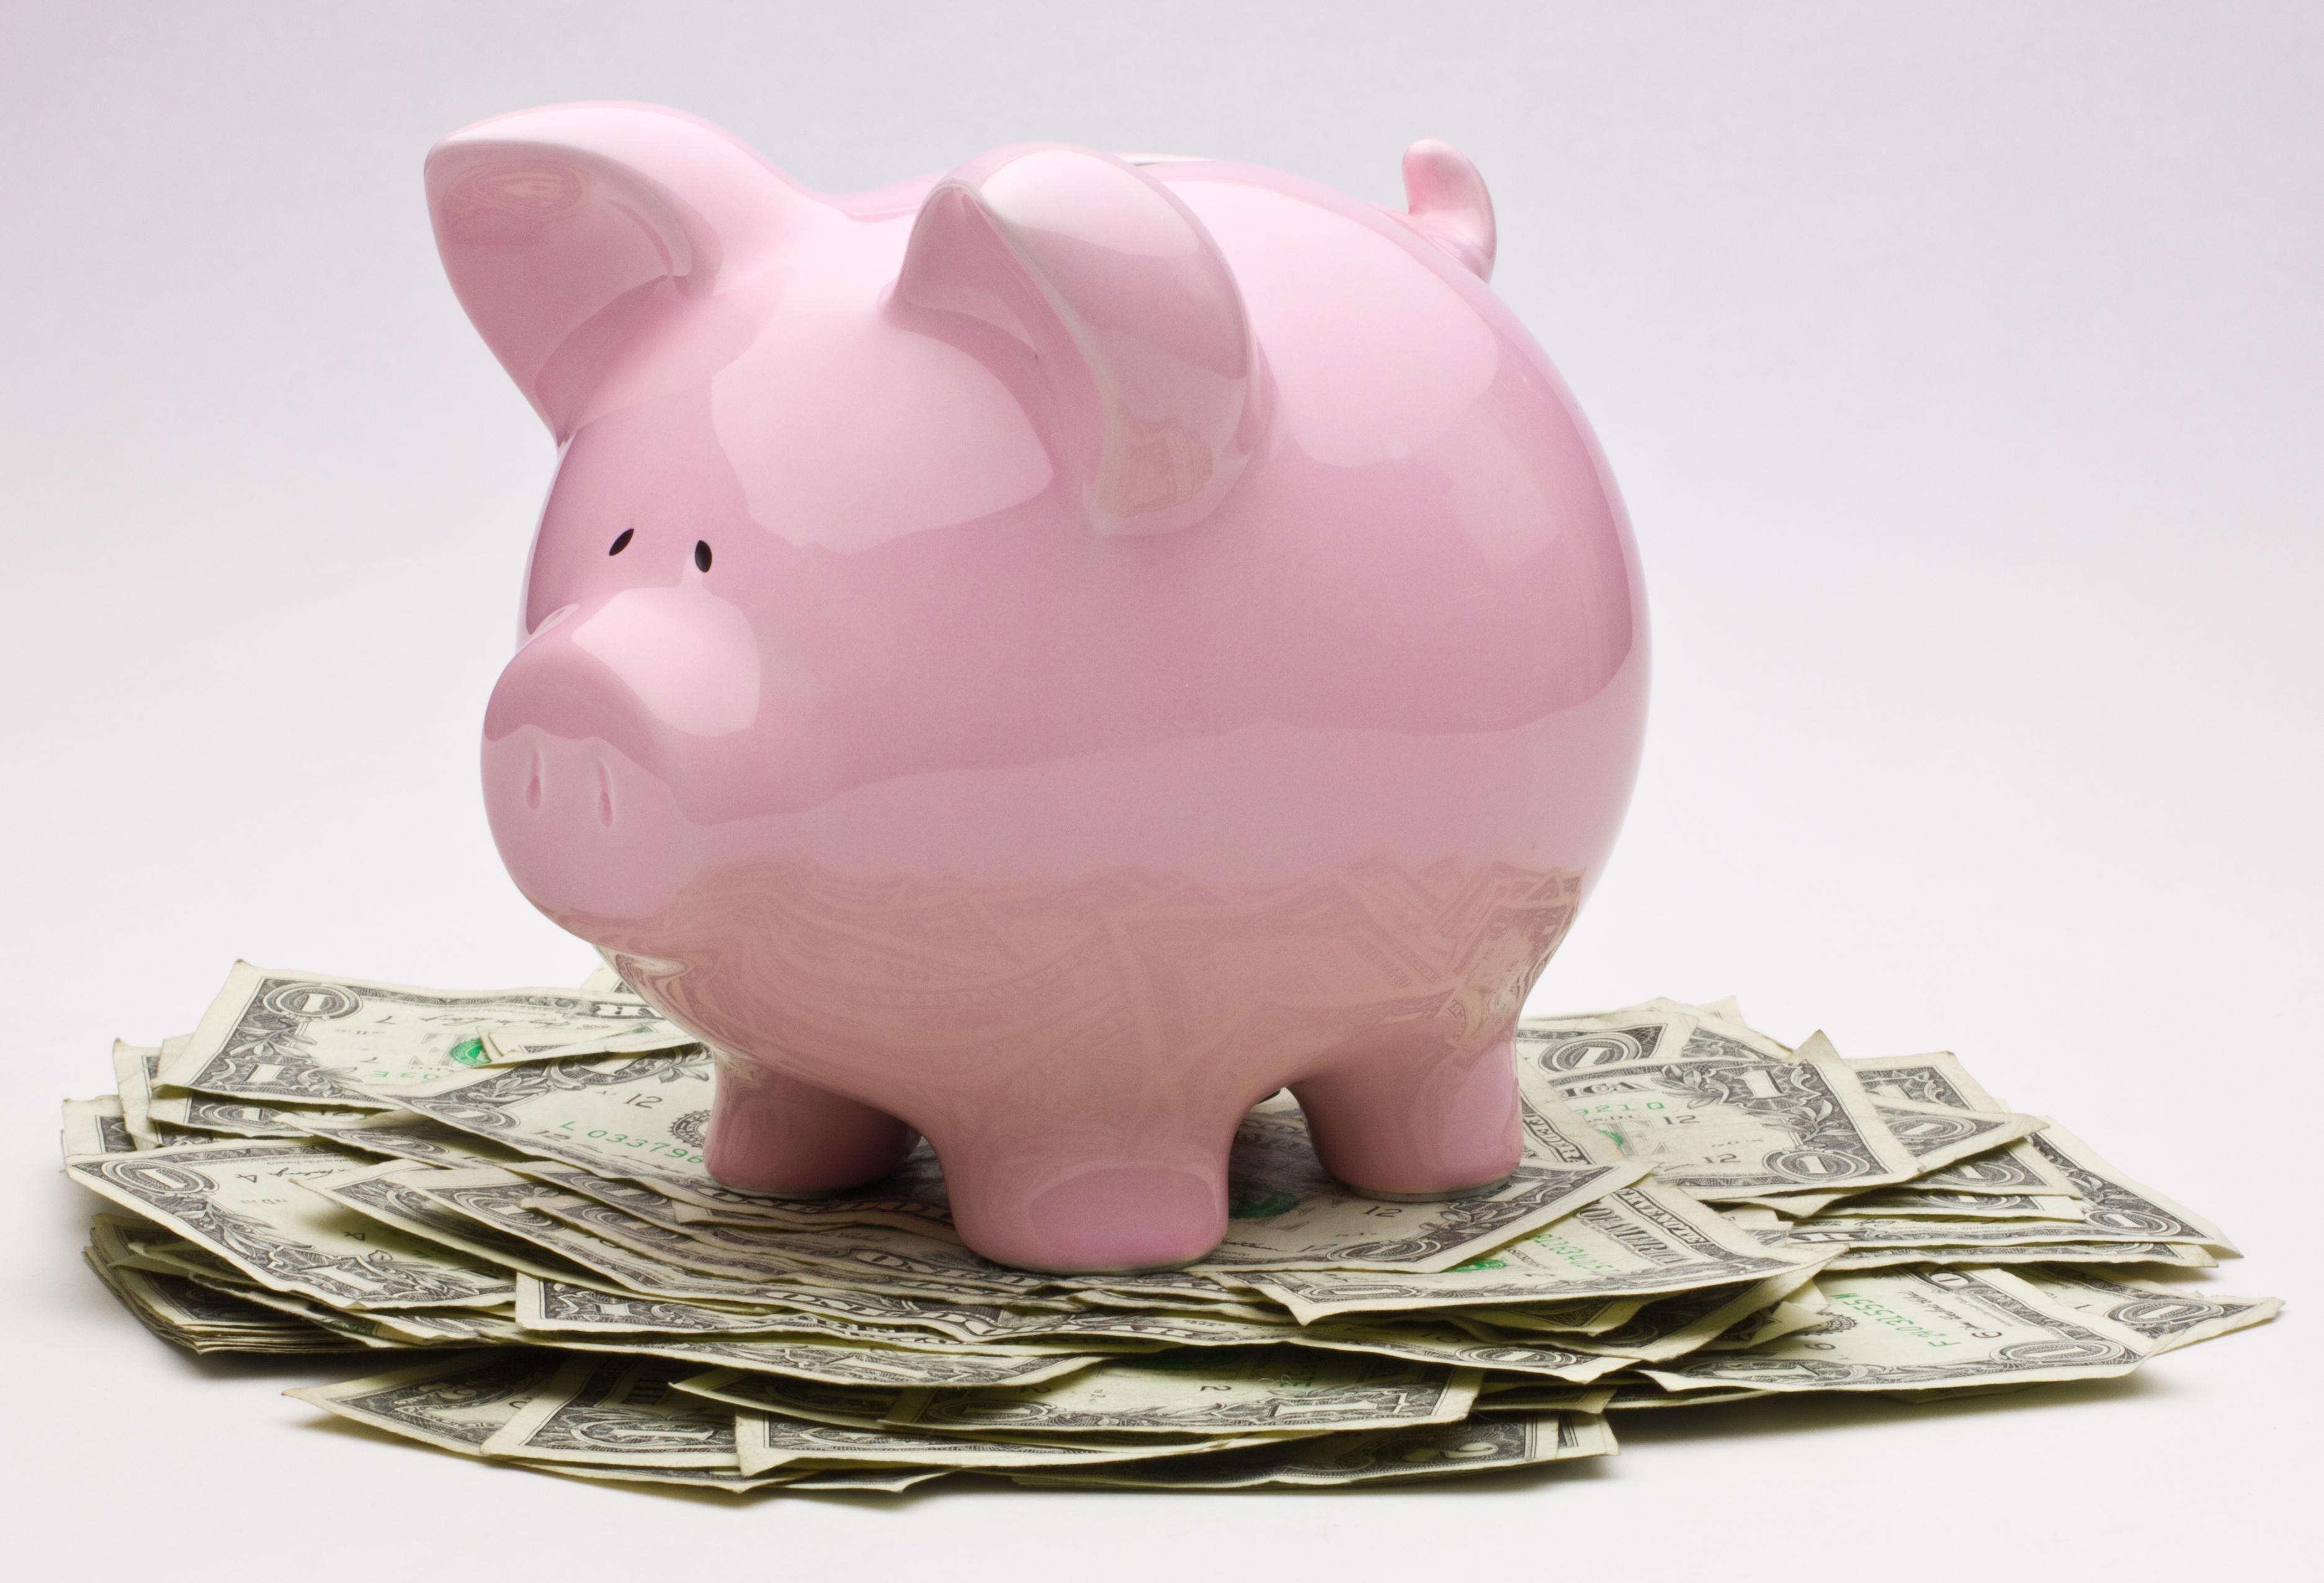 Saving Money On Natural Gas Bills